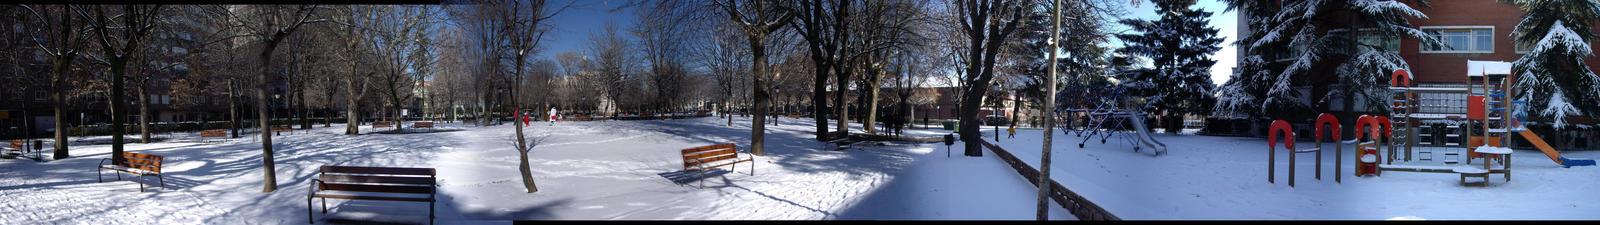 Un parque nevado by Epikuros